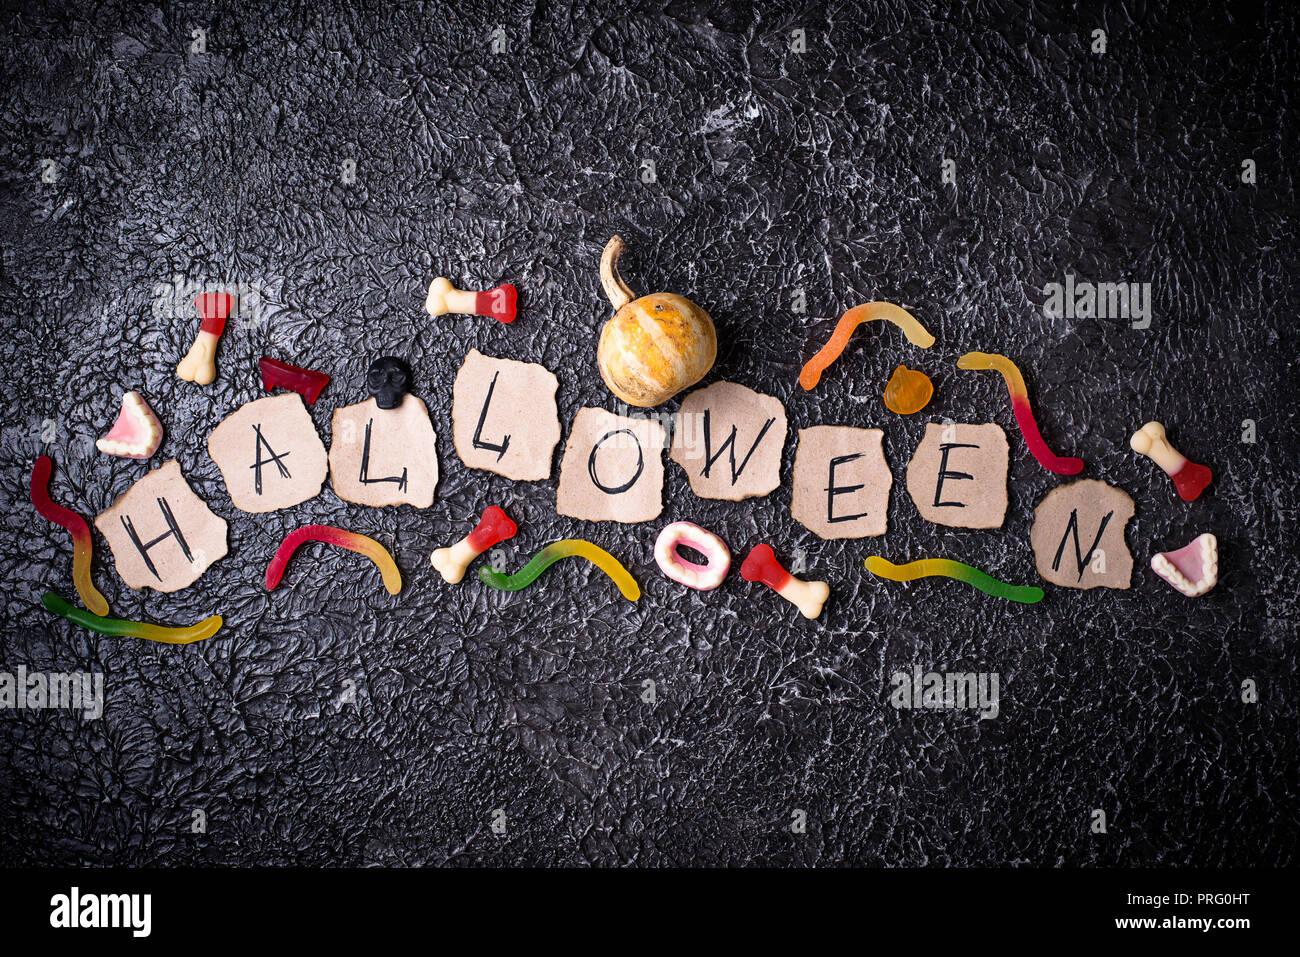 Kreative Halloween Hintergrund mit Leckereien Stockbild